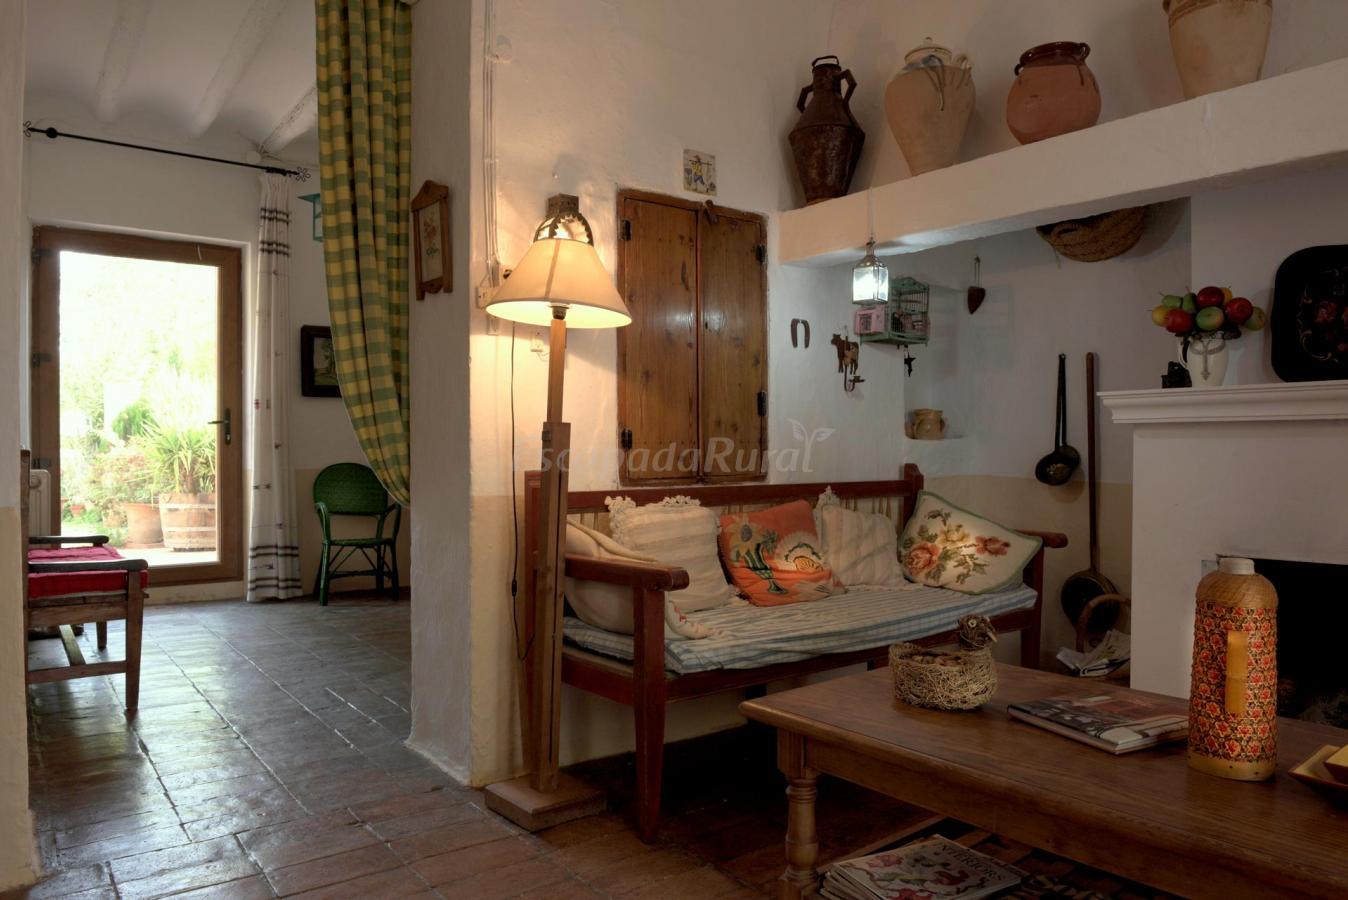 Fotos de casa santa elena casa rural en yecla murcia - Casa rural santa elena ...